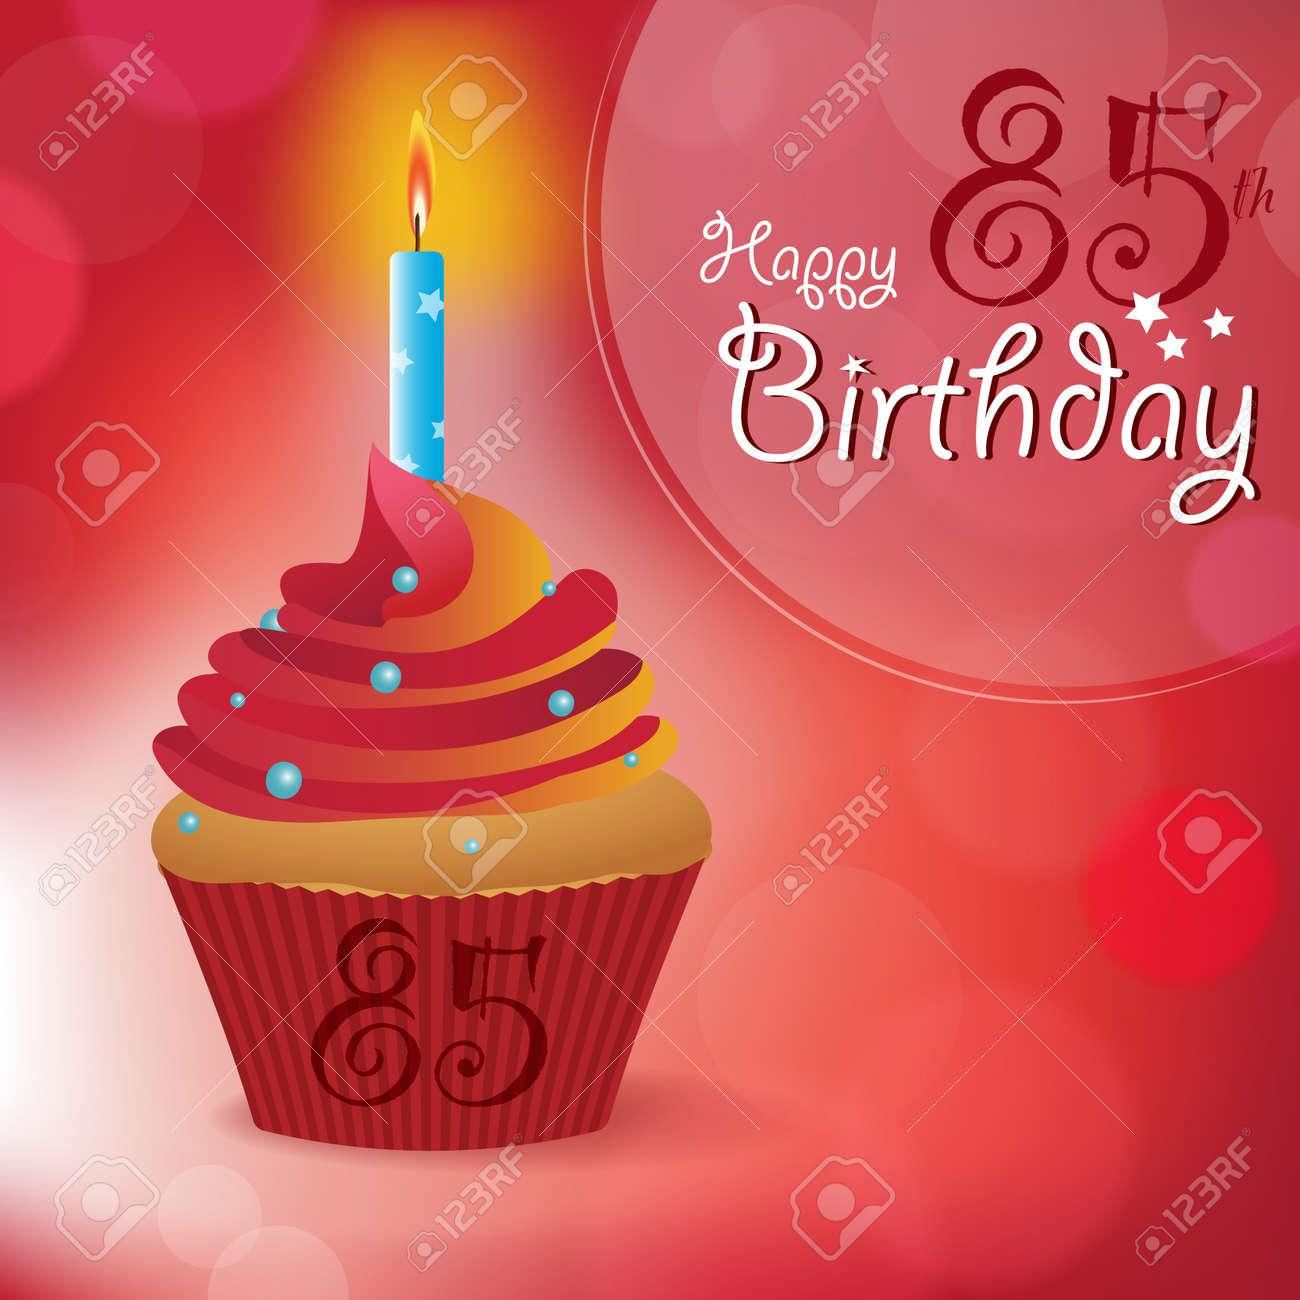 Happy 85th Birthday Greeting Invitation Message Bokeh Vector – 85th Birthday Cards